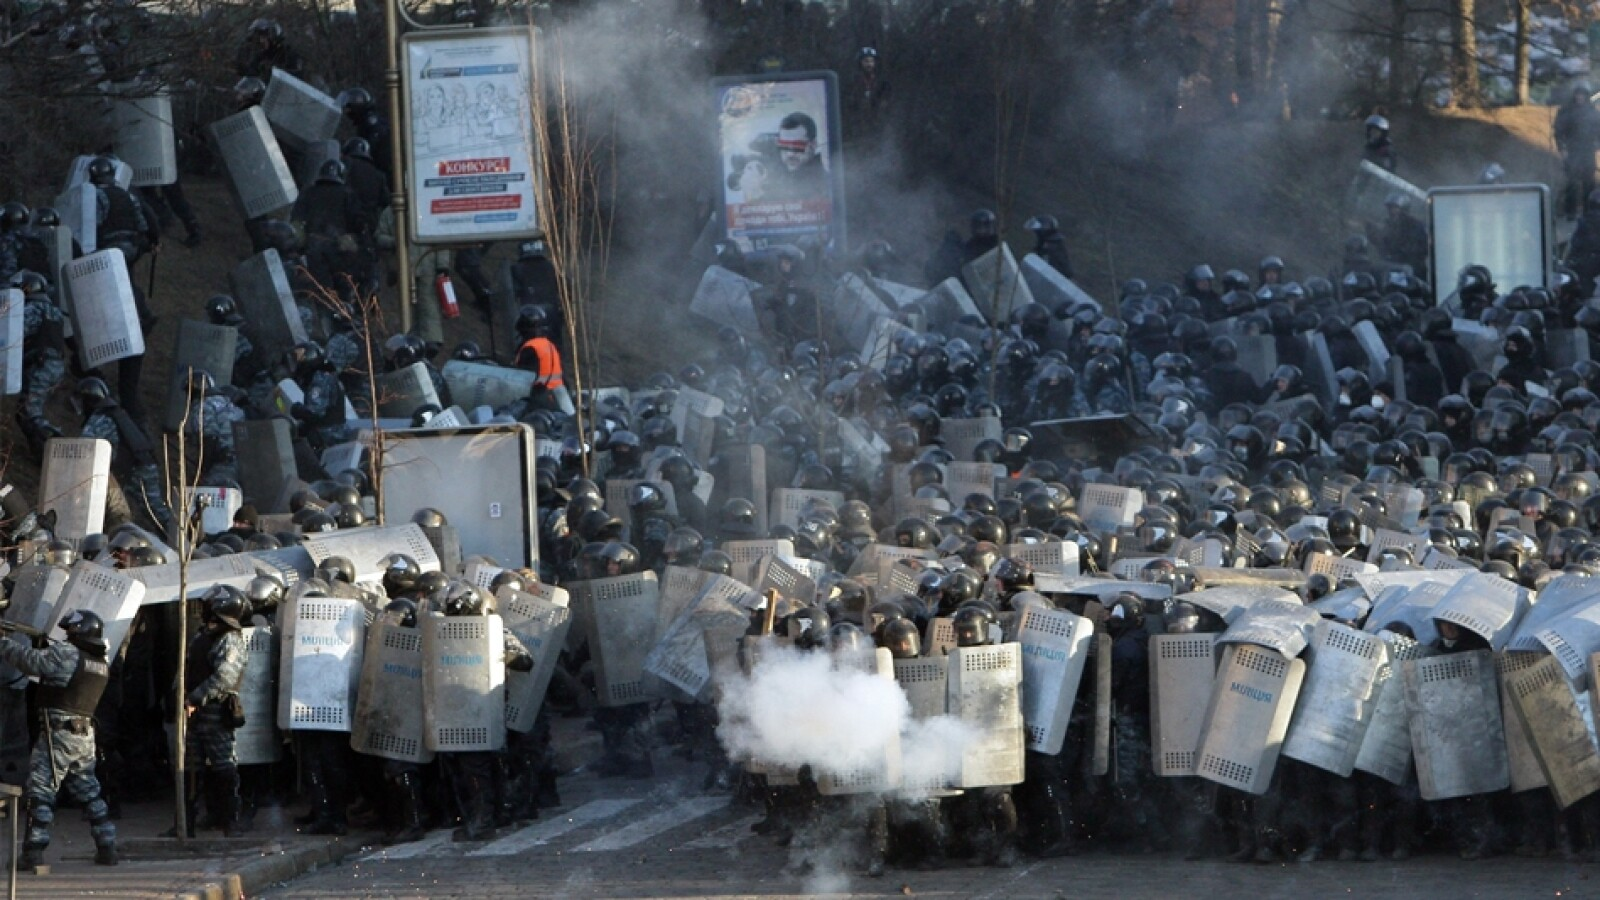 AFP ucrania, protestas 8